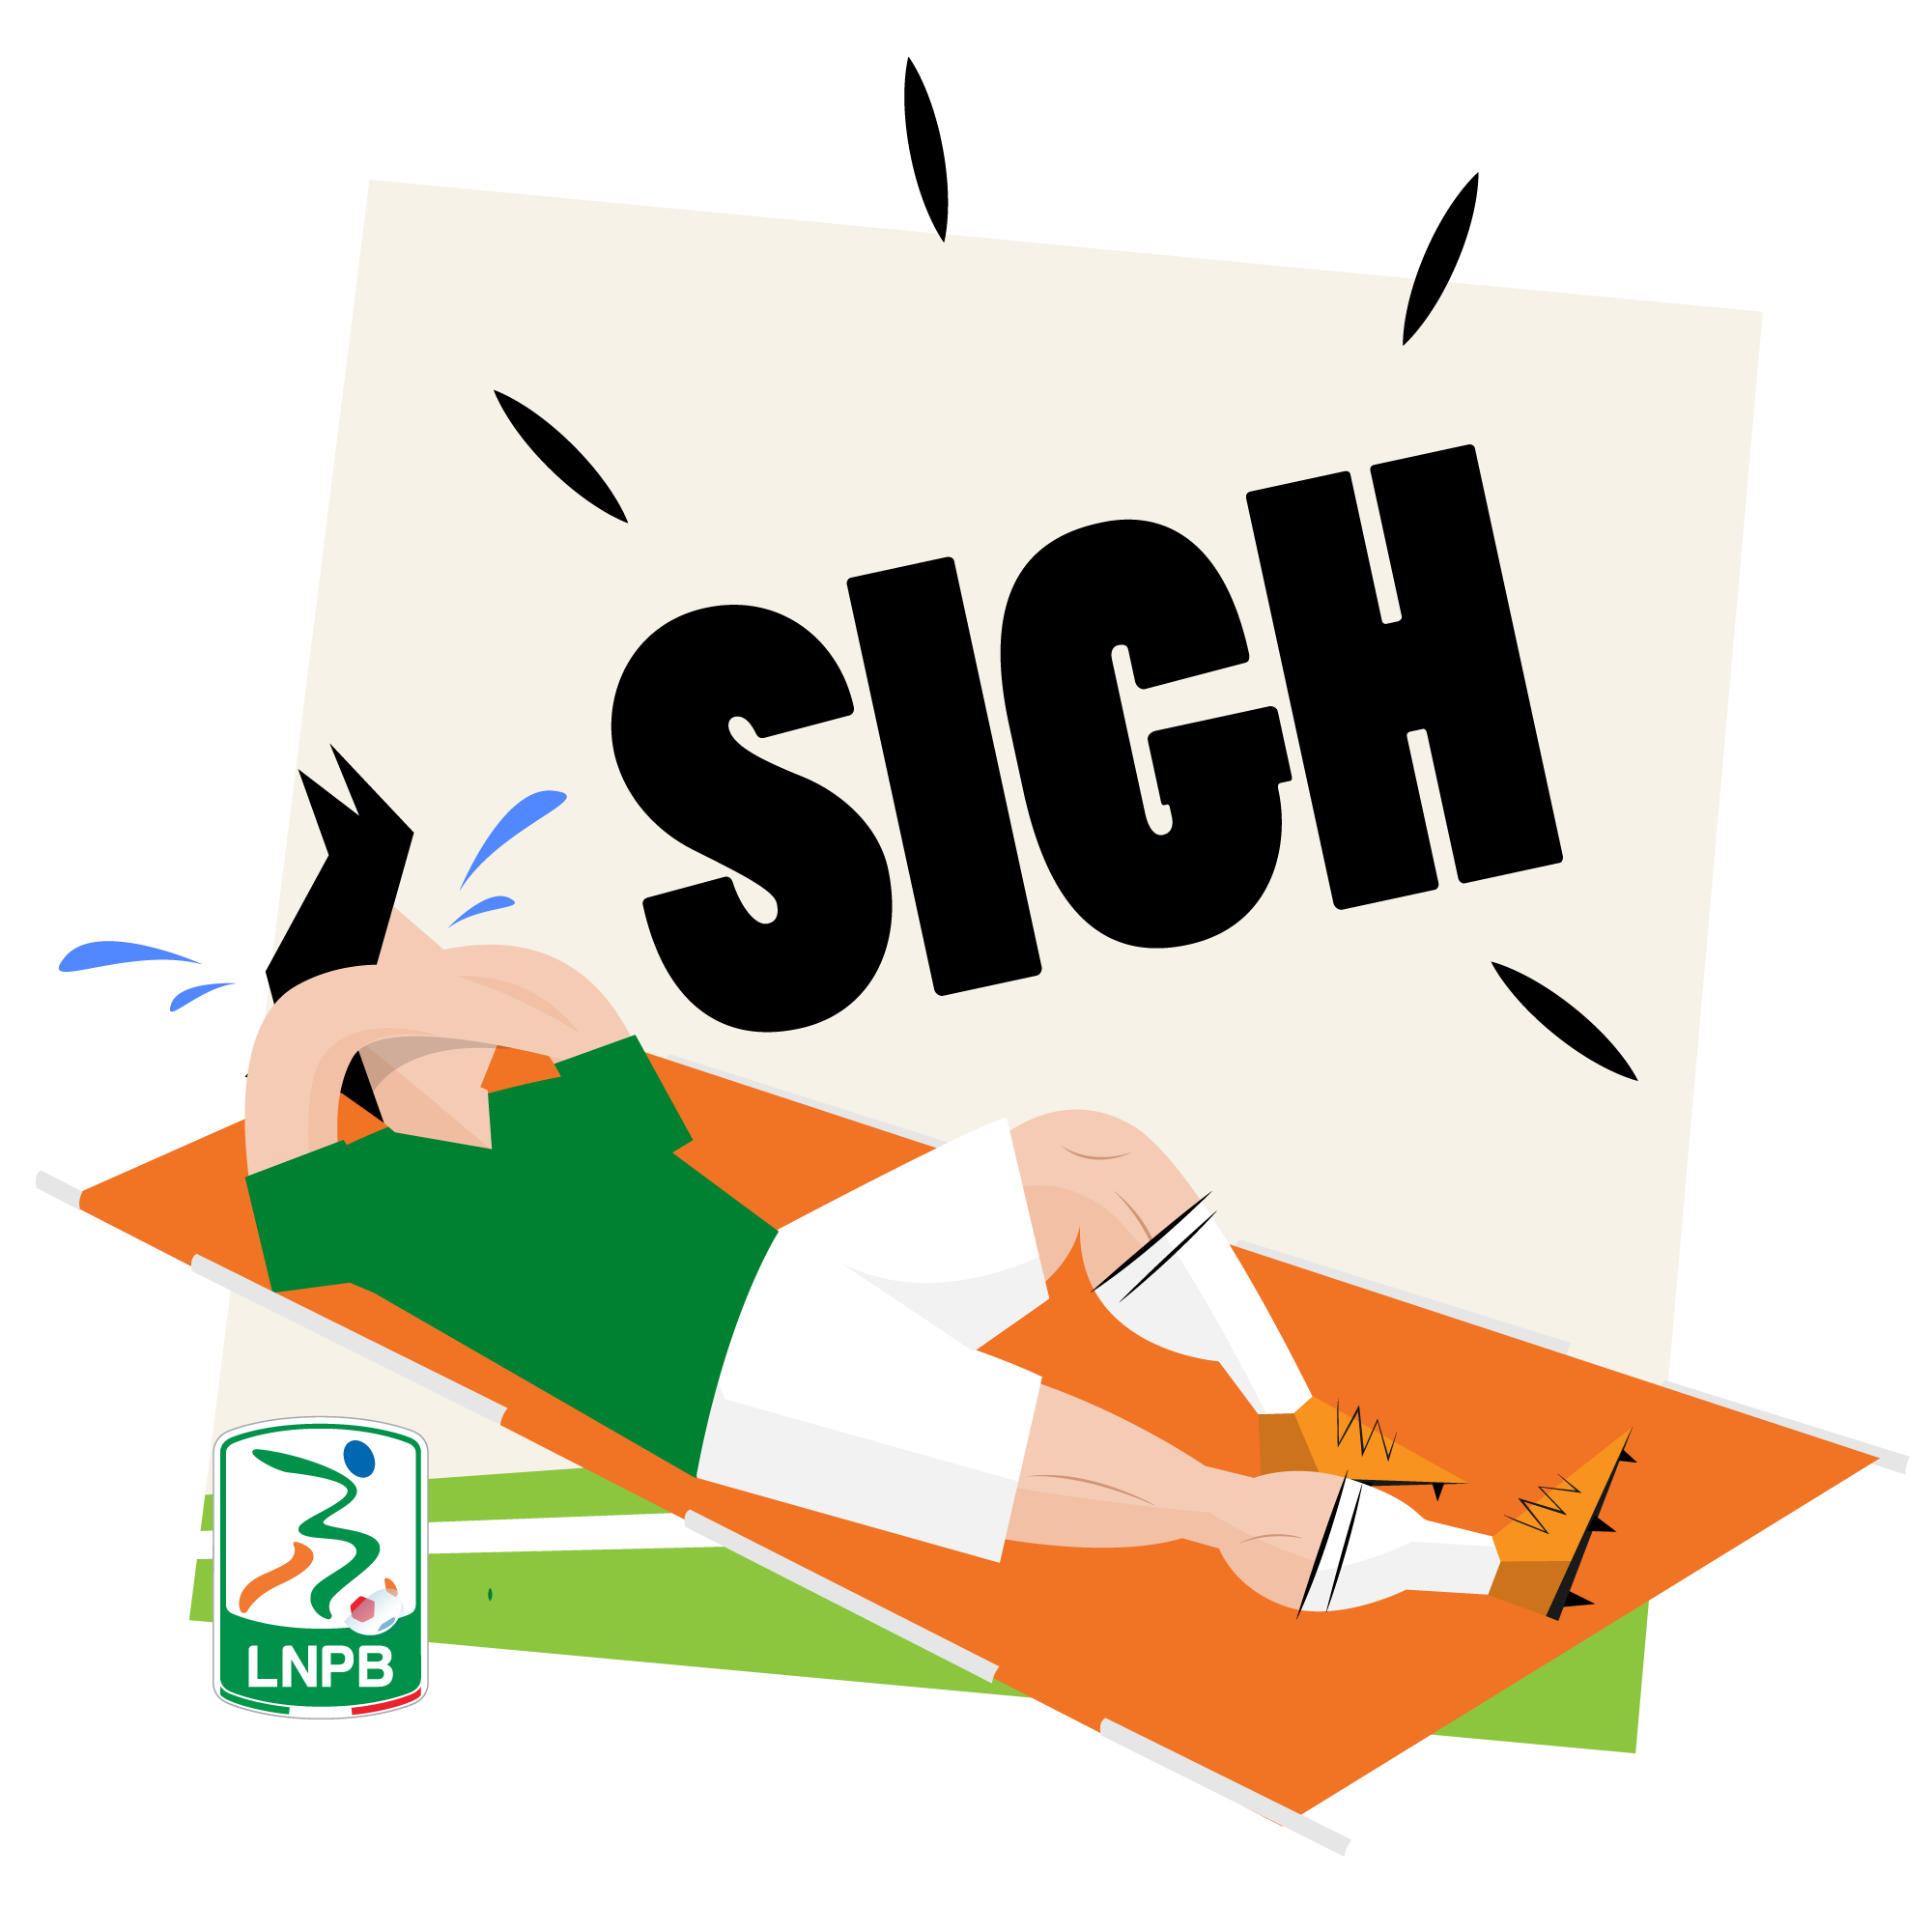 Lega B - App ufficiale messages sticker-1